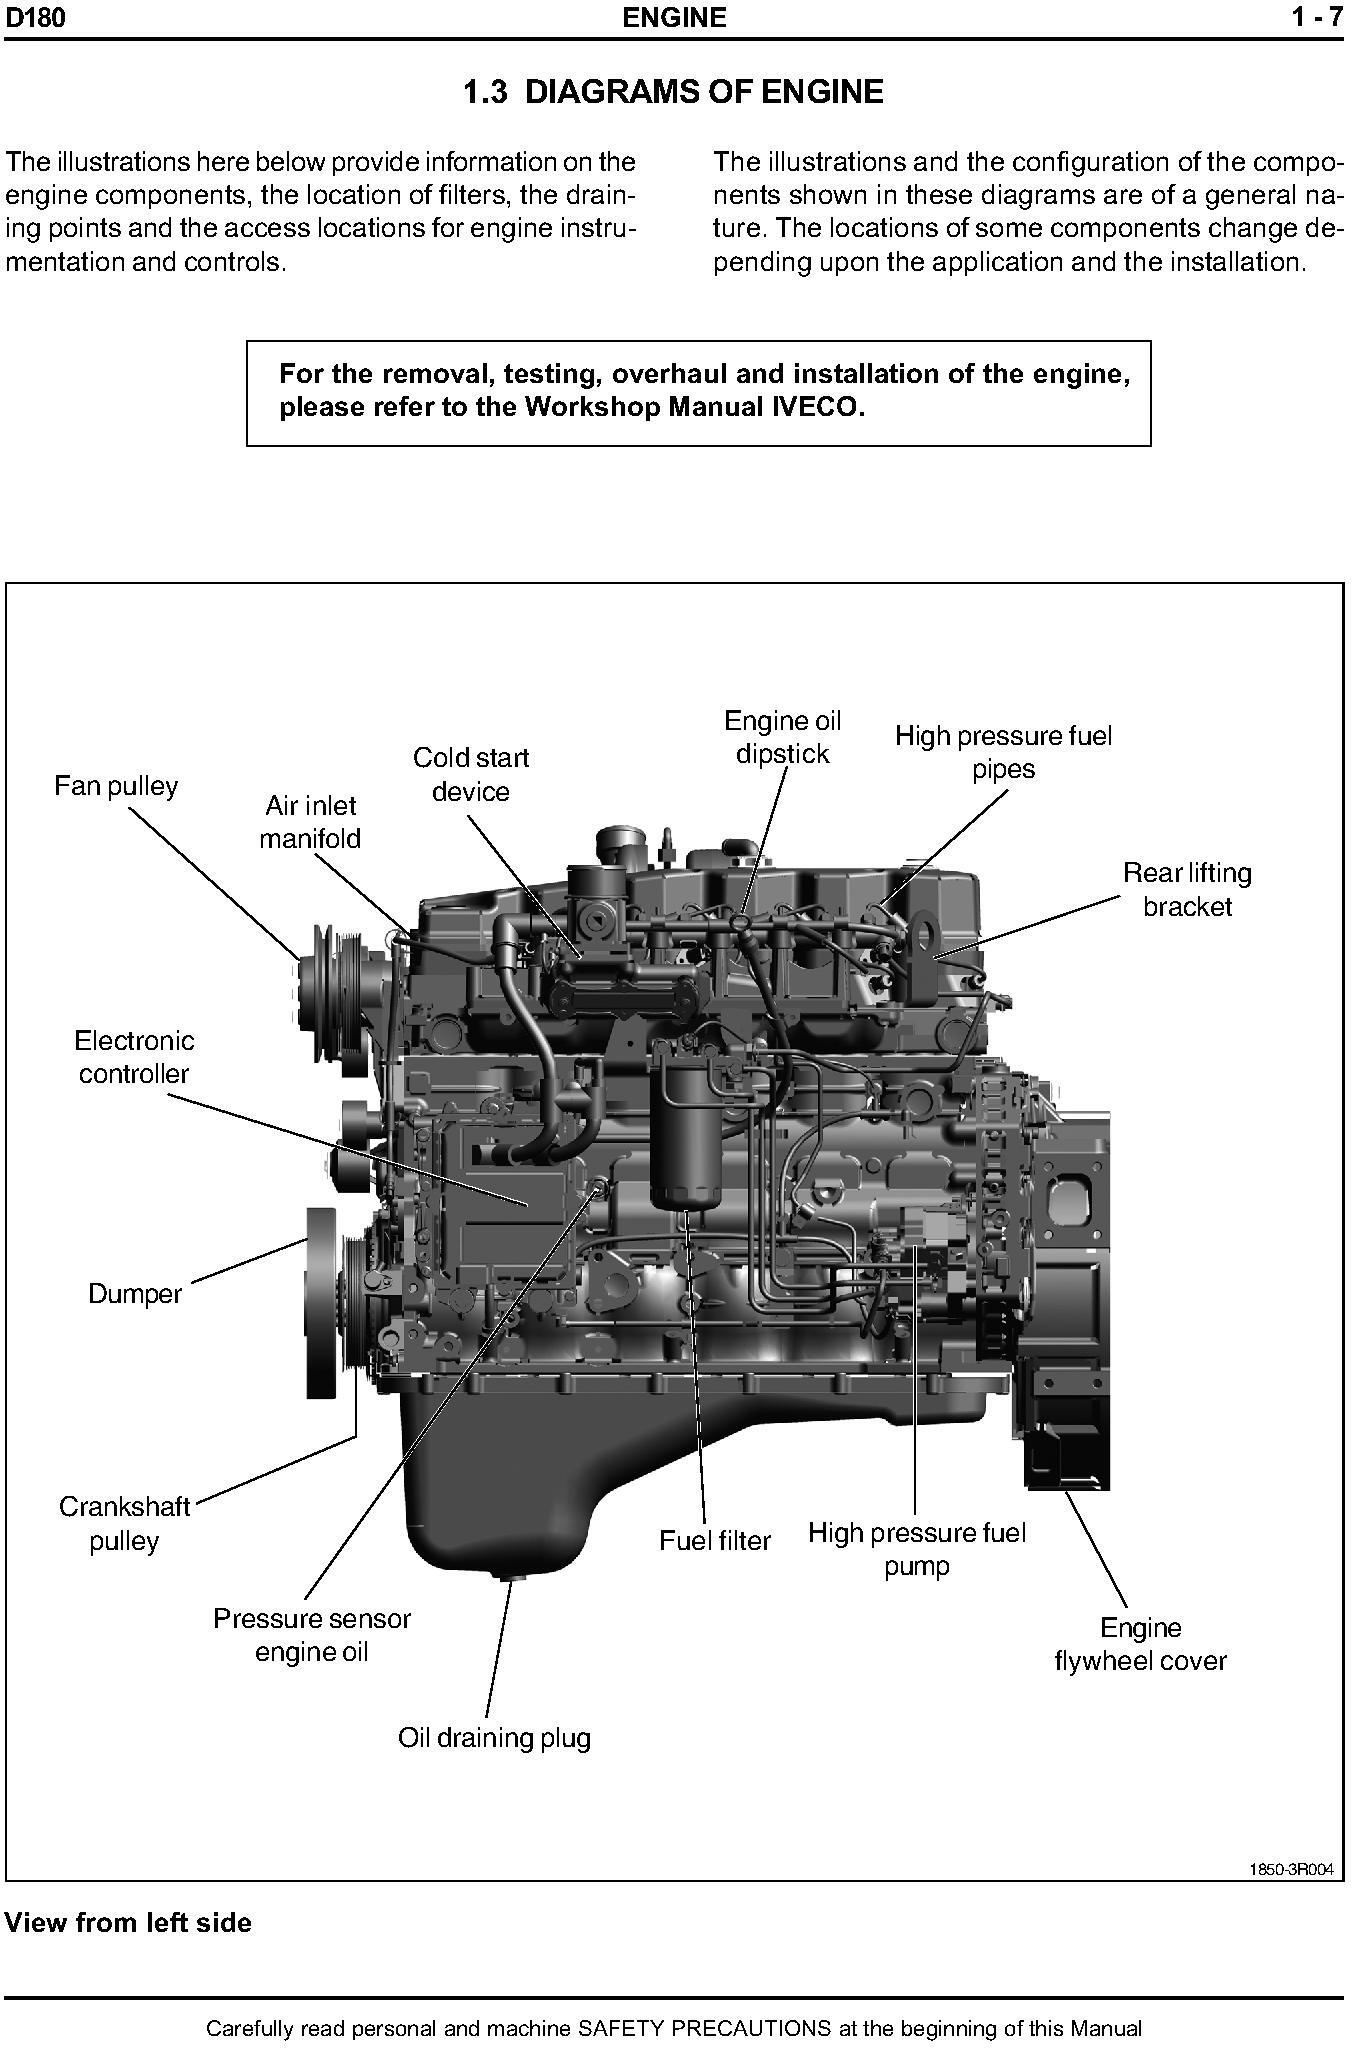 New Holland D180 Crawler Dozer Tier 3 Workshop Service Manual - 2